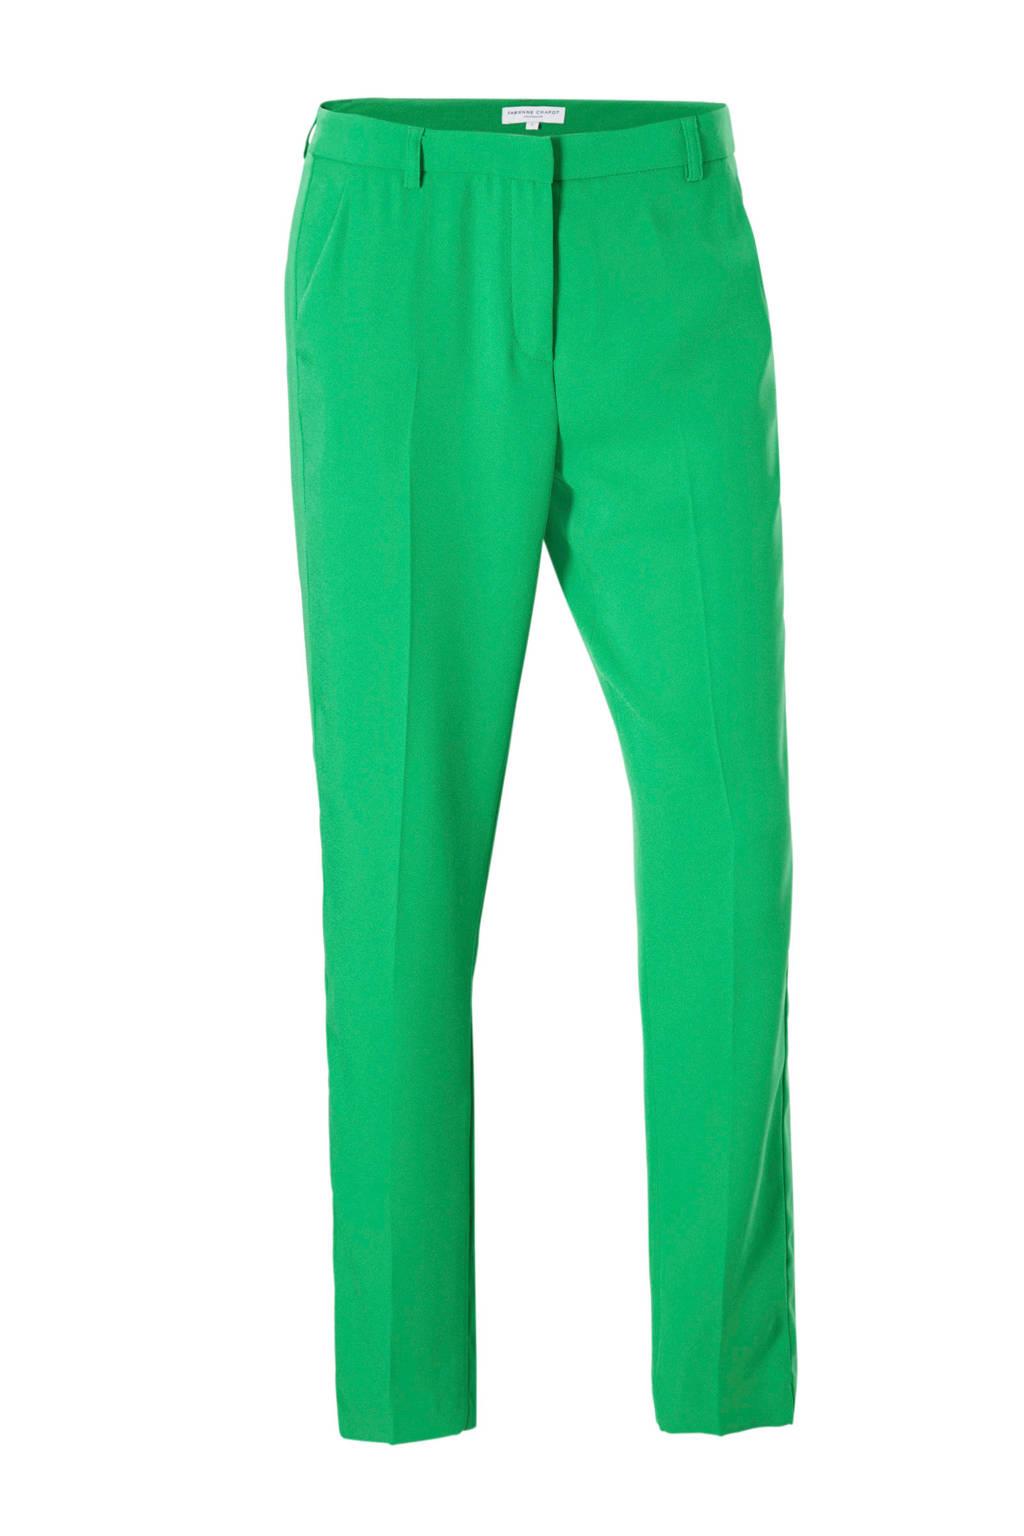 Fabienne Chapot Merel straight fit broek, Groen